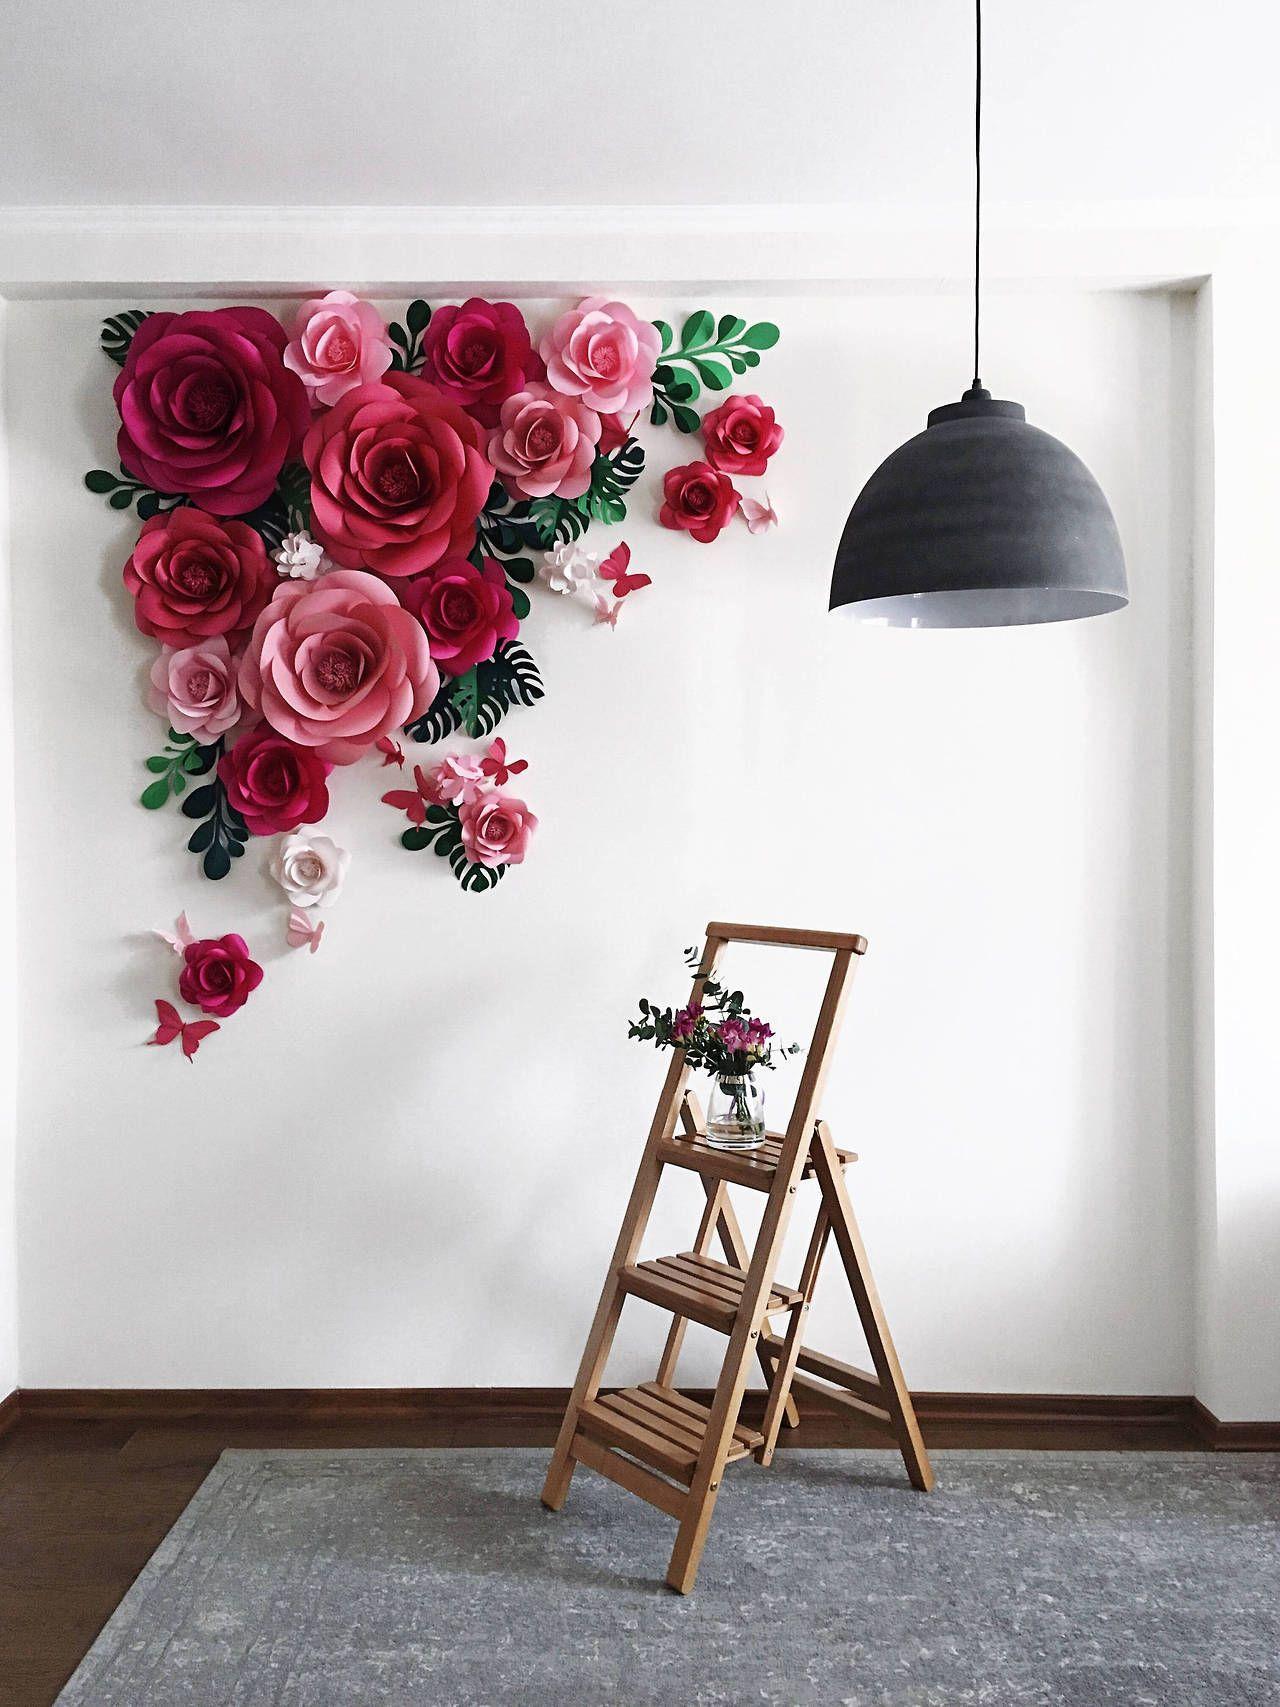 Diy paper flower wedding decorations  paper fleurs  surpresa criativa  Pinterest  Flowers Facebook and